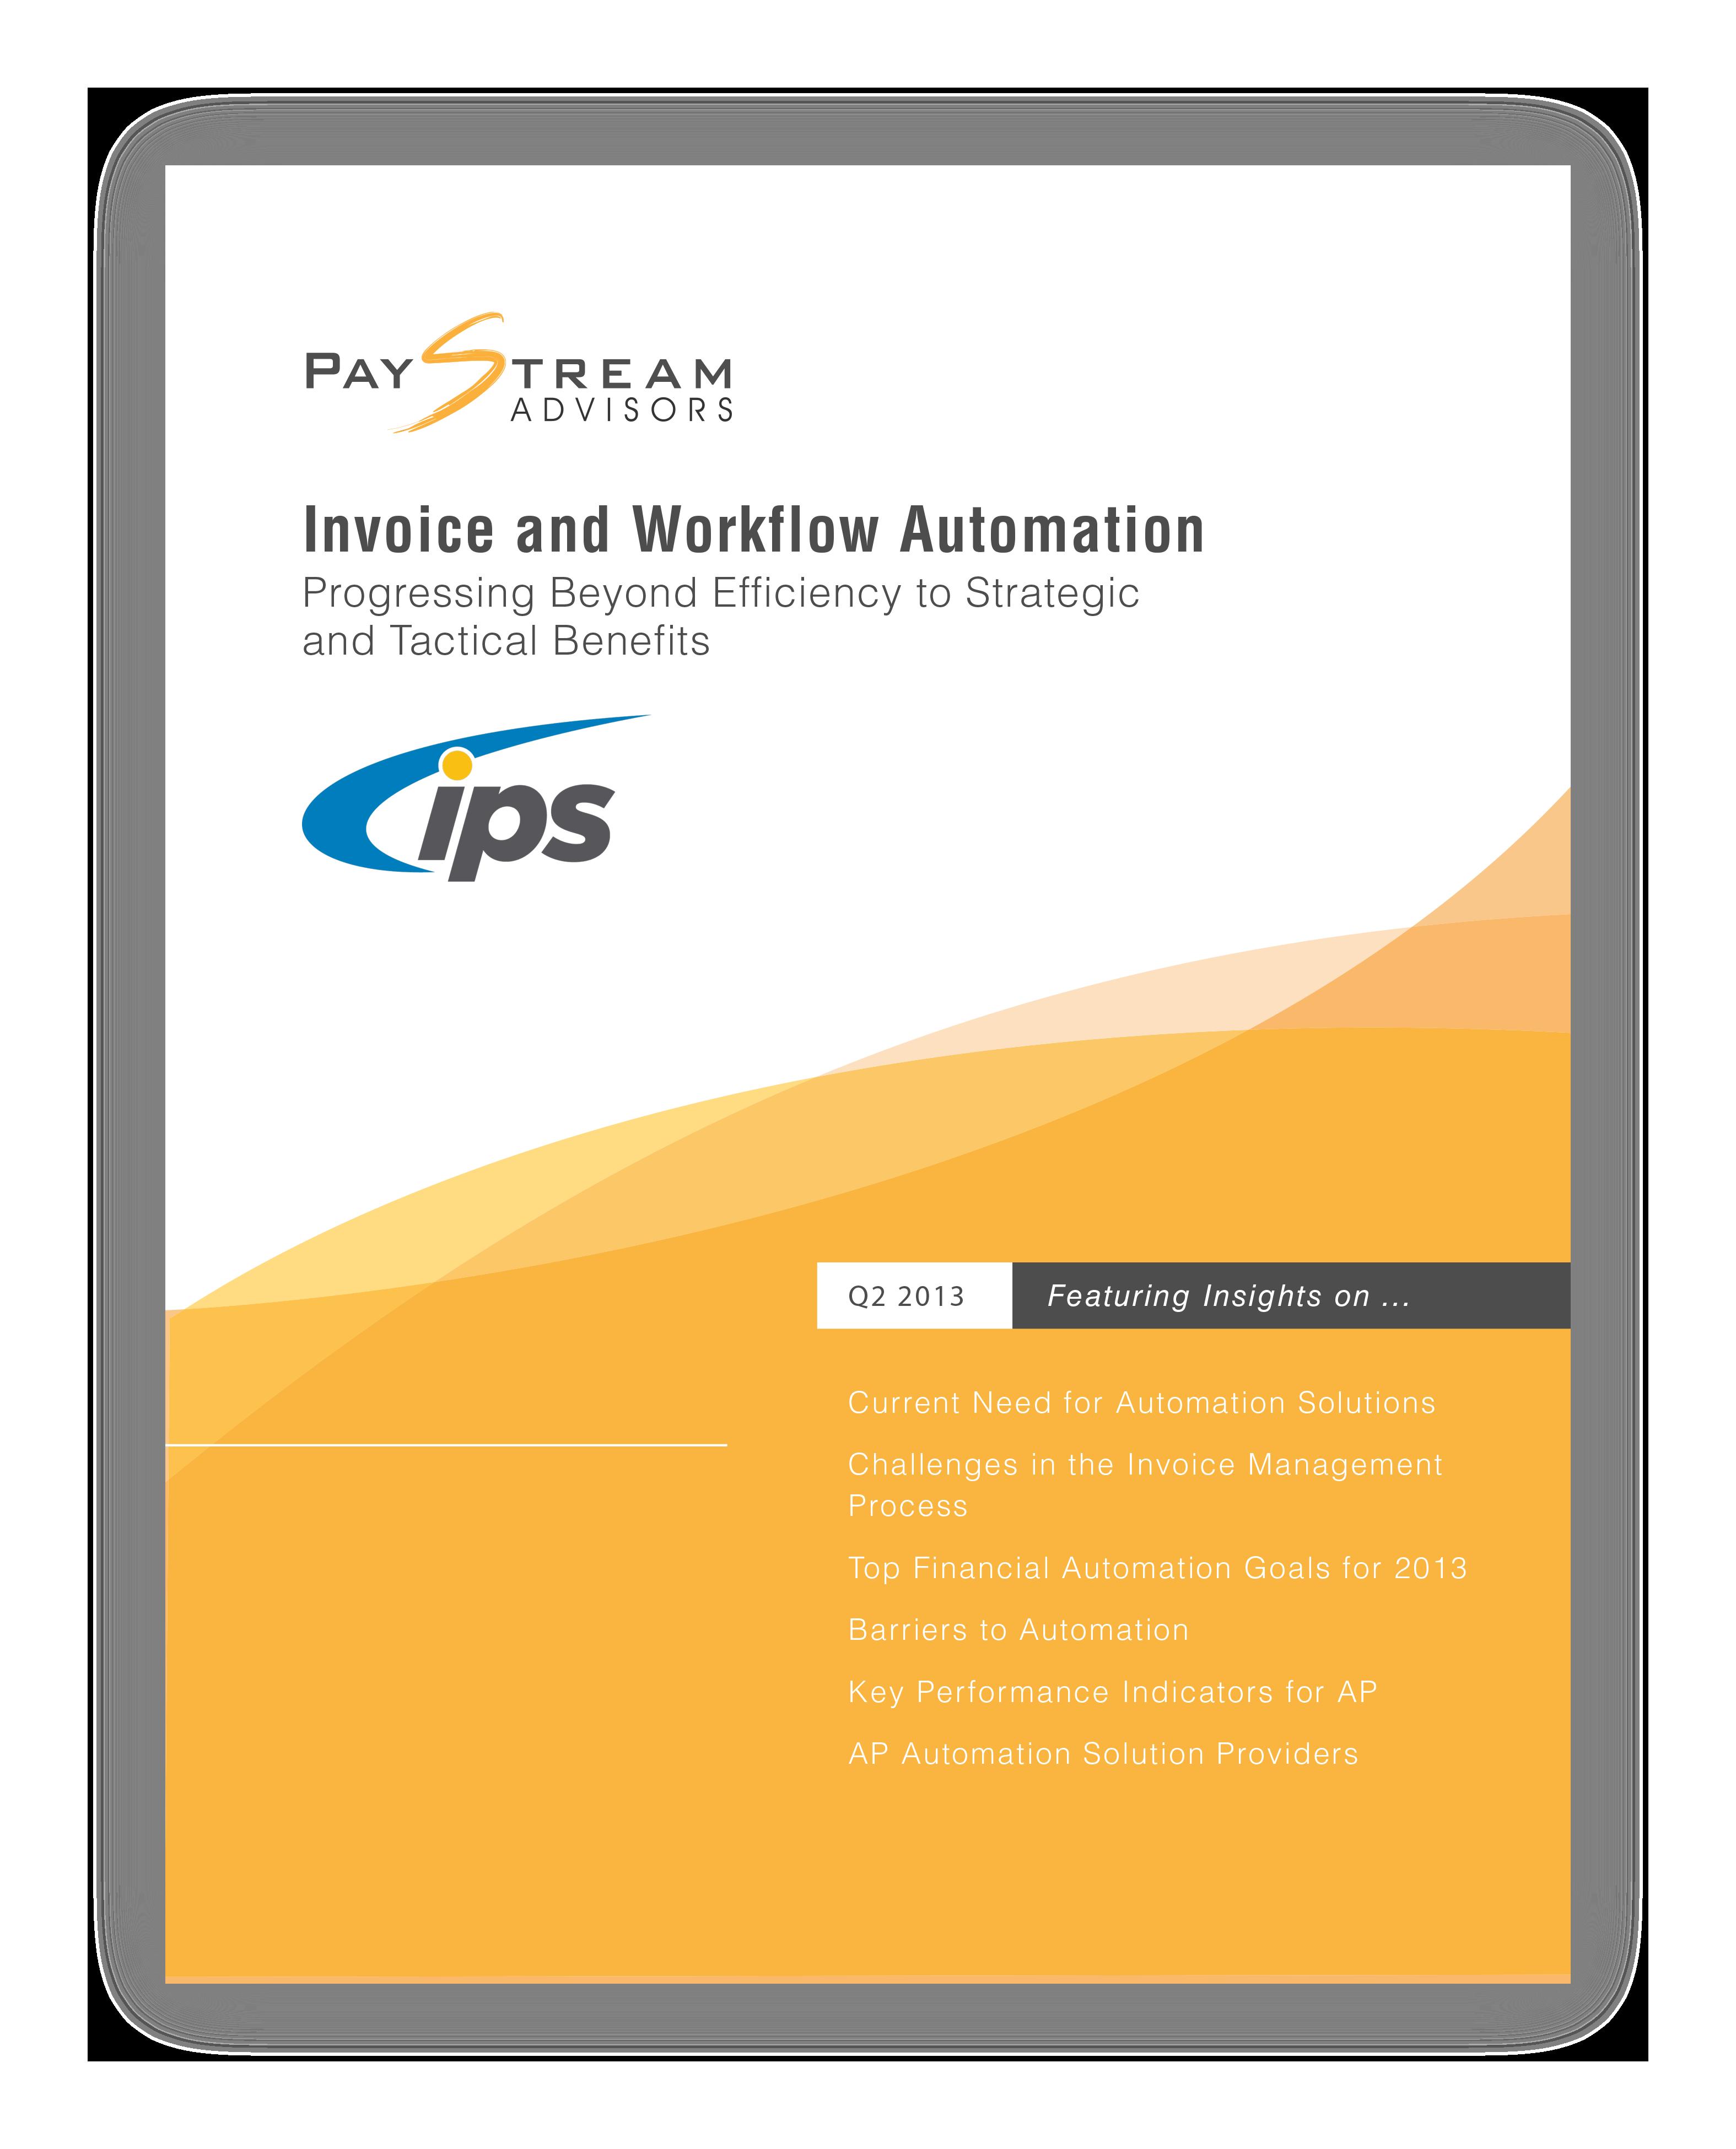 Paystream_Advisors_Report_IPS-cover v2.png